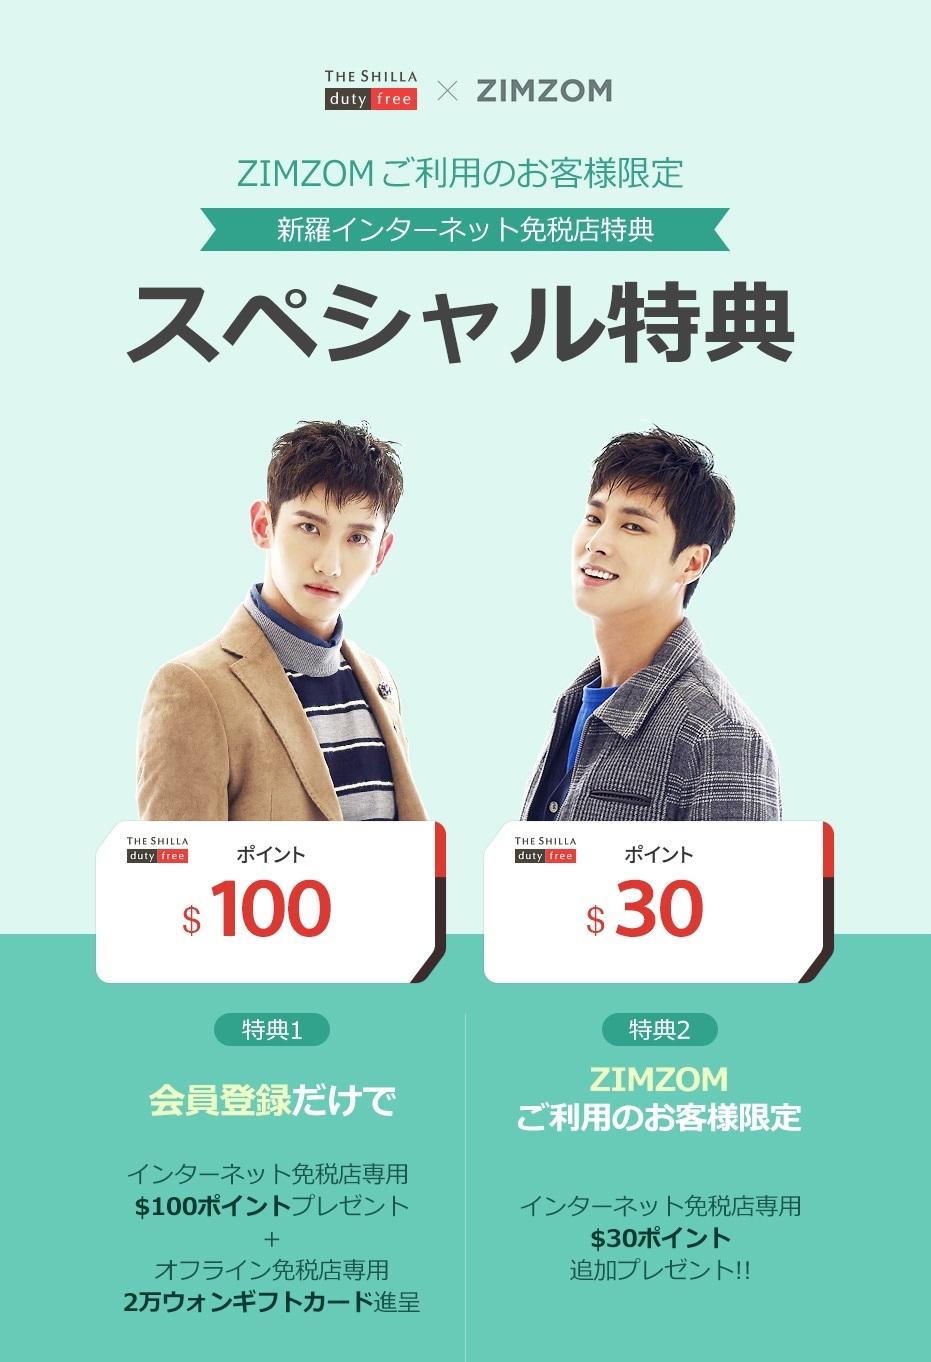 ZIMZOM-AIR ご利用のお客様限定 新羅インターネット免税店特典 スペシャル特典